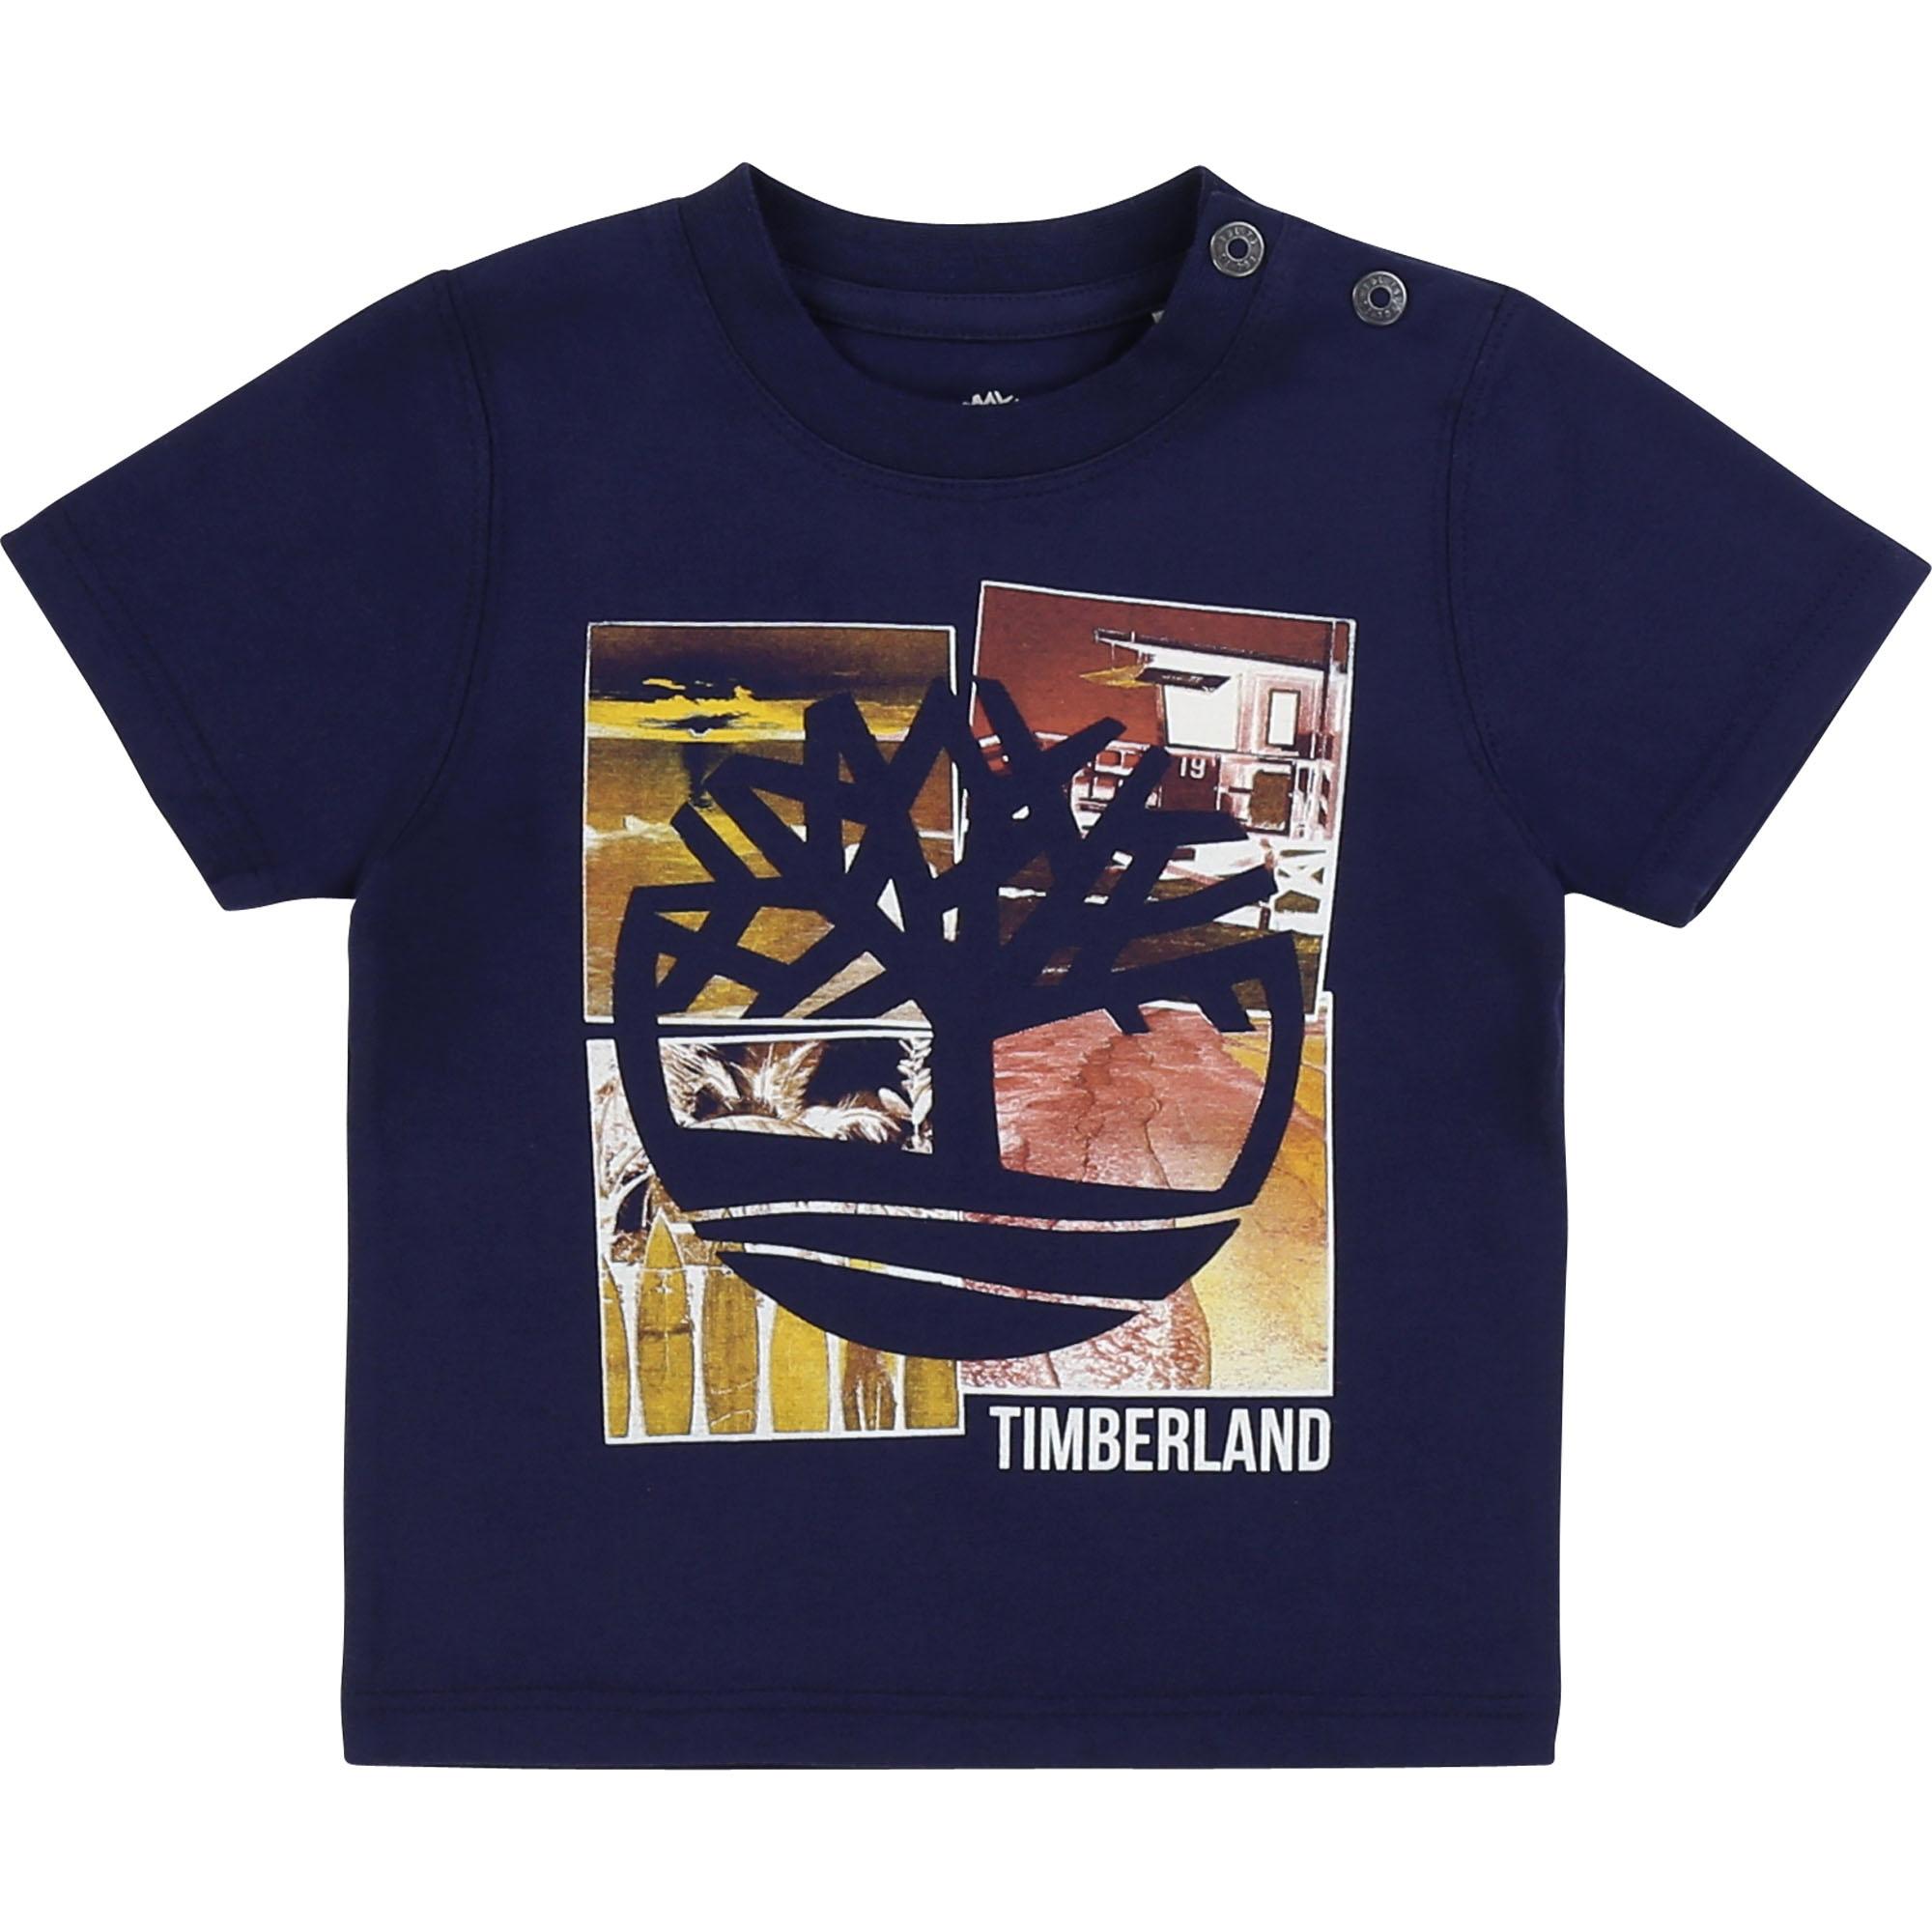 https://www.leadermode.com/188827/timberland-t05j18-85t-indigo-blue.jpg